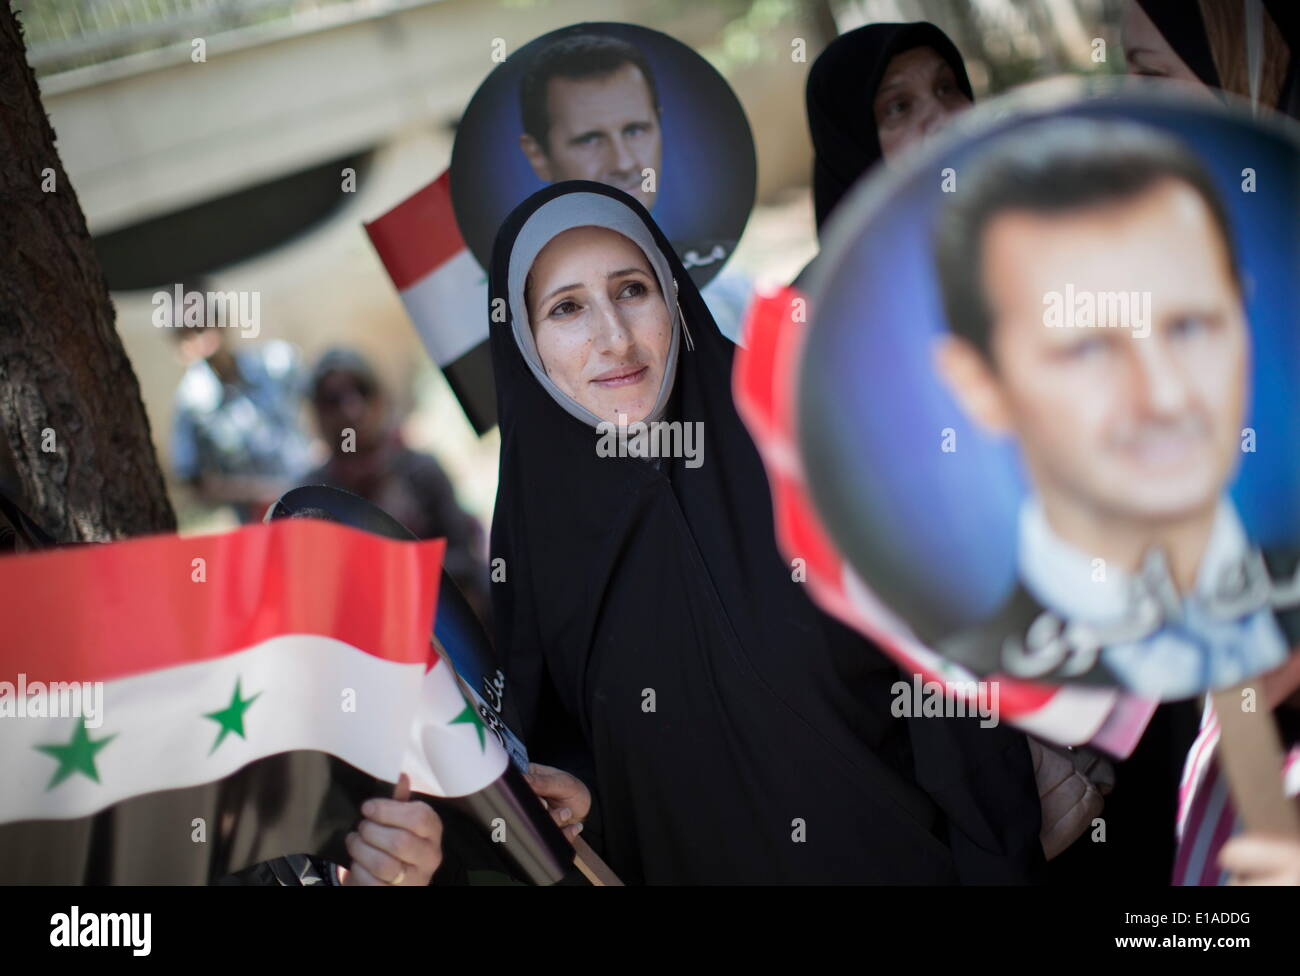 2014 Syrian presidential election